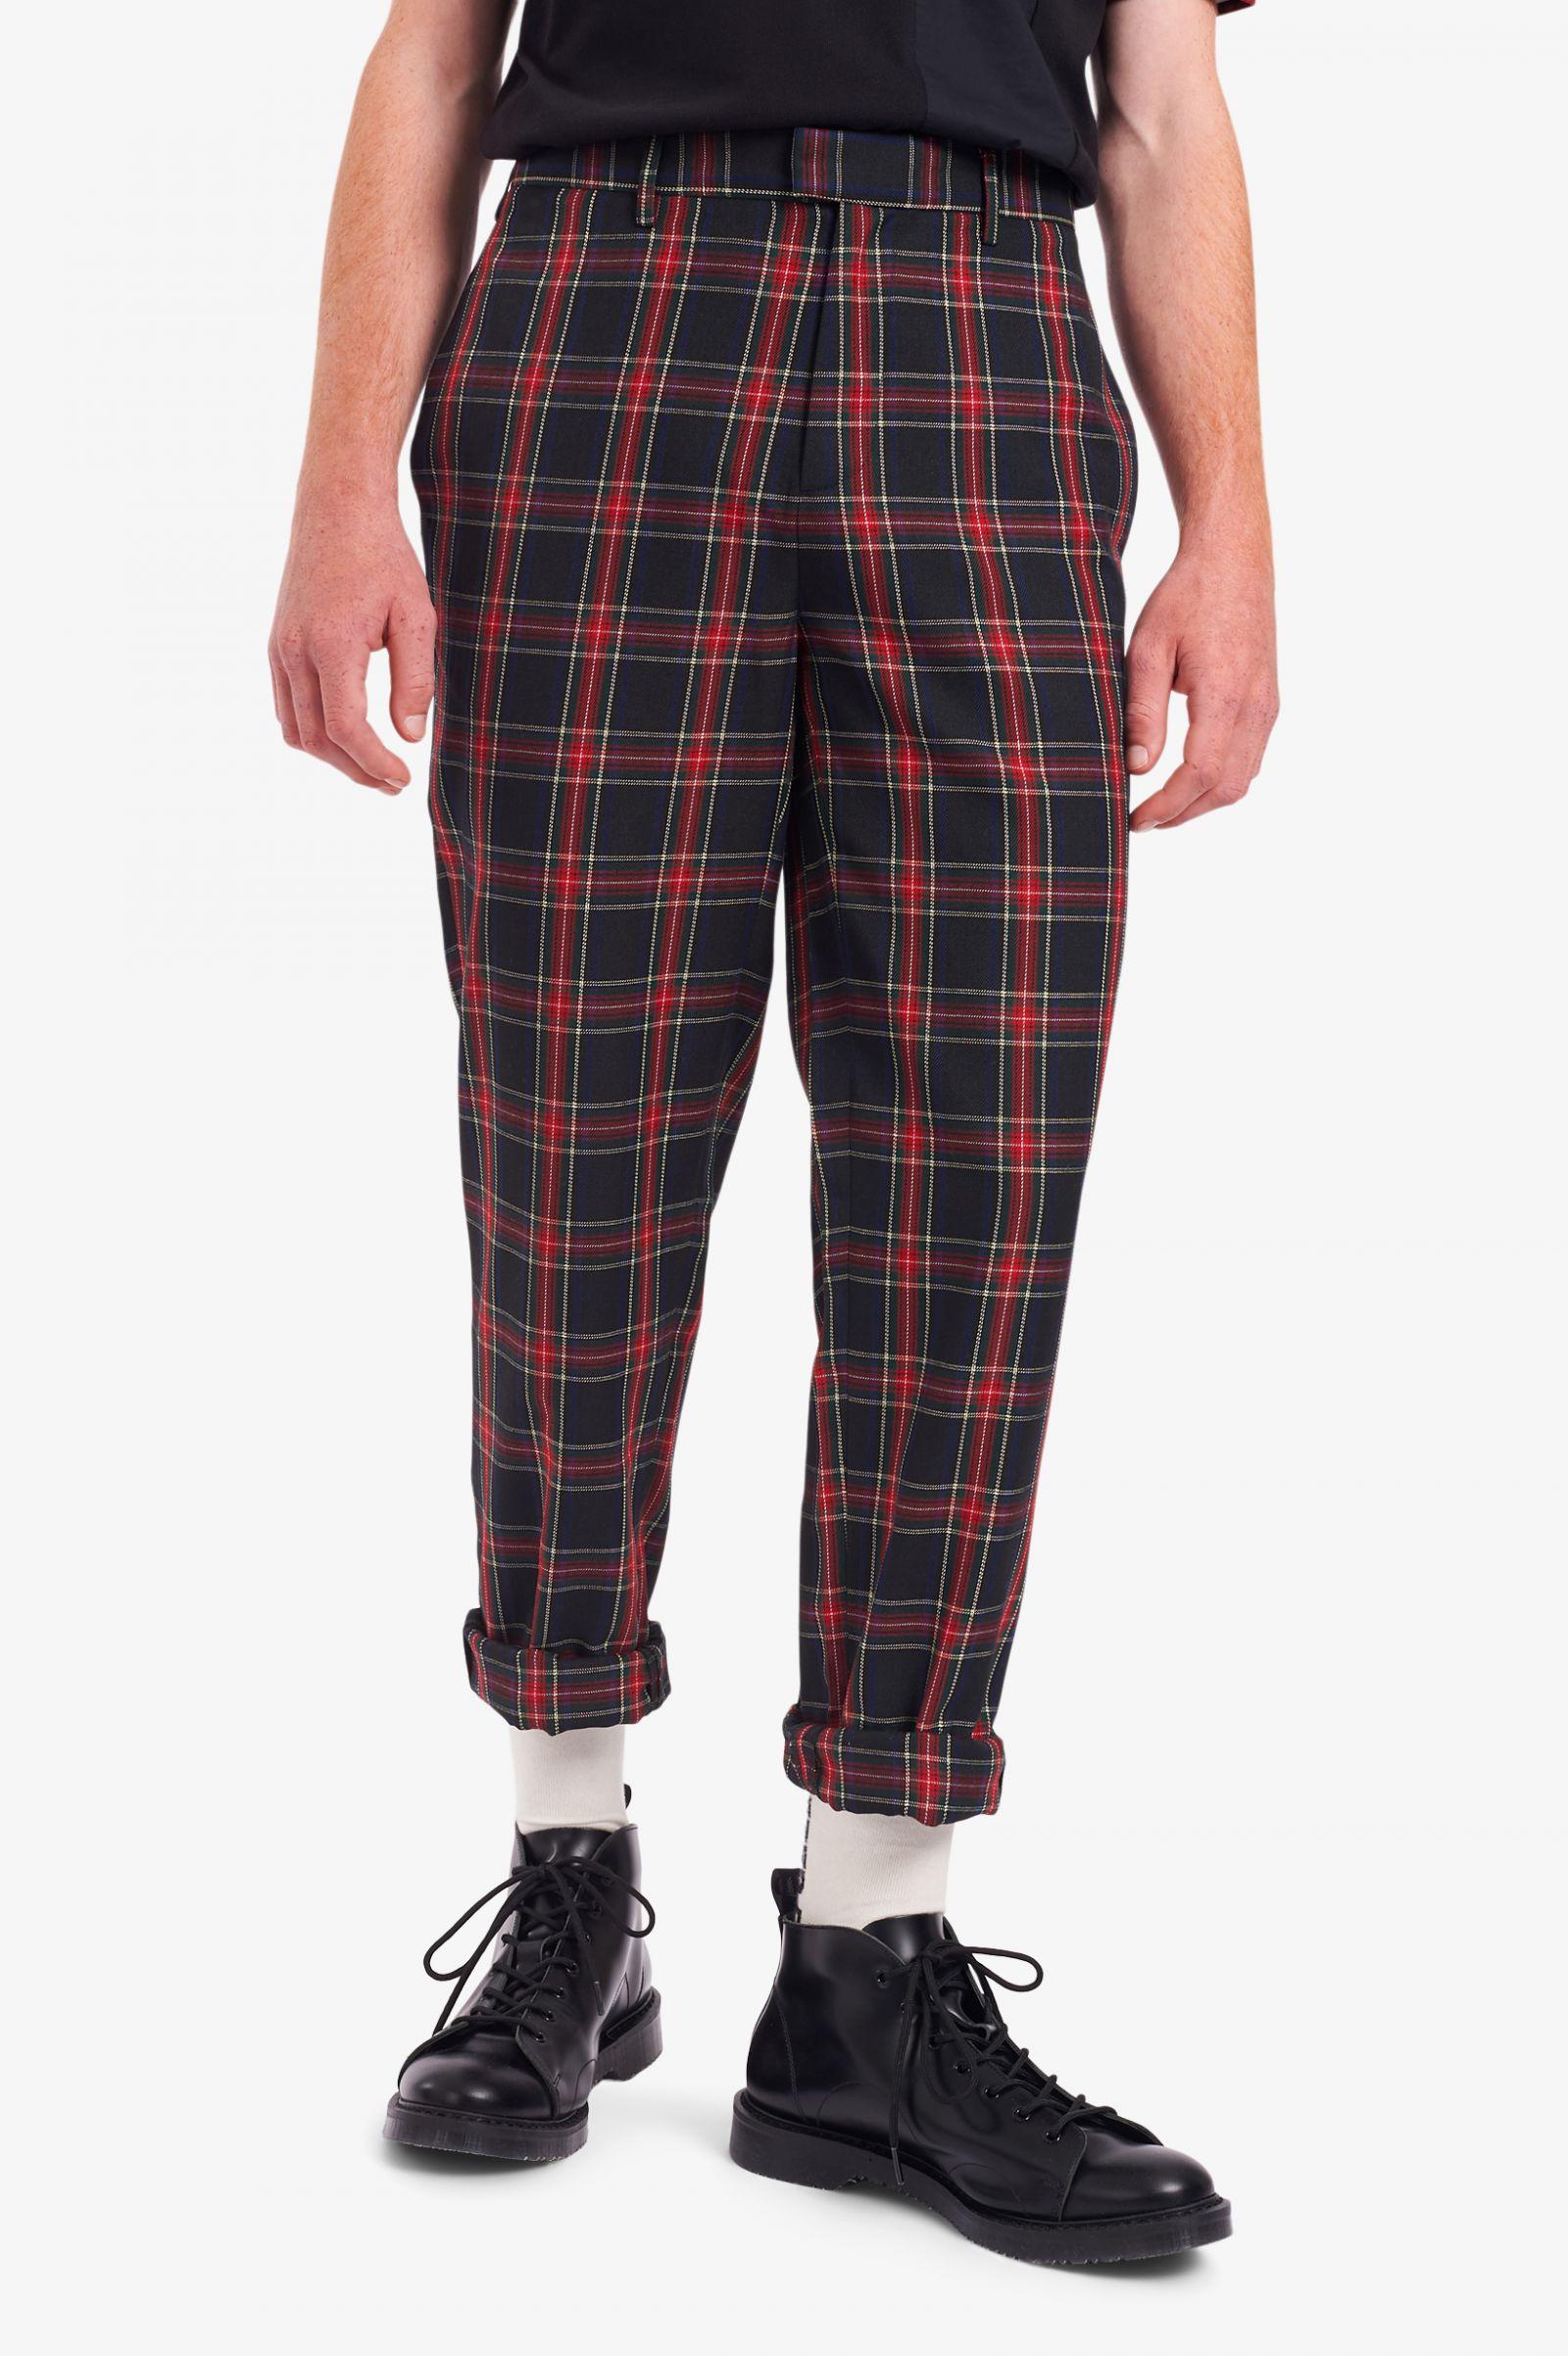 Pantalones A Cuadros Escoceses De Tartan Negro Pantalones Para Hombre Chinos Joggers Pantalones Casual Fred Perry Es